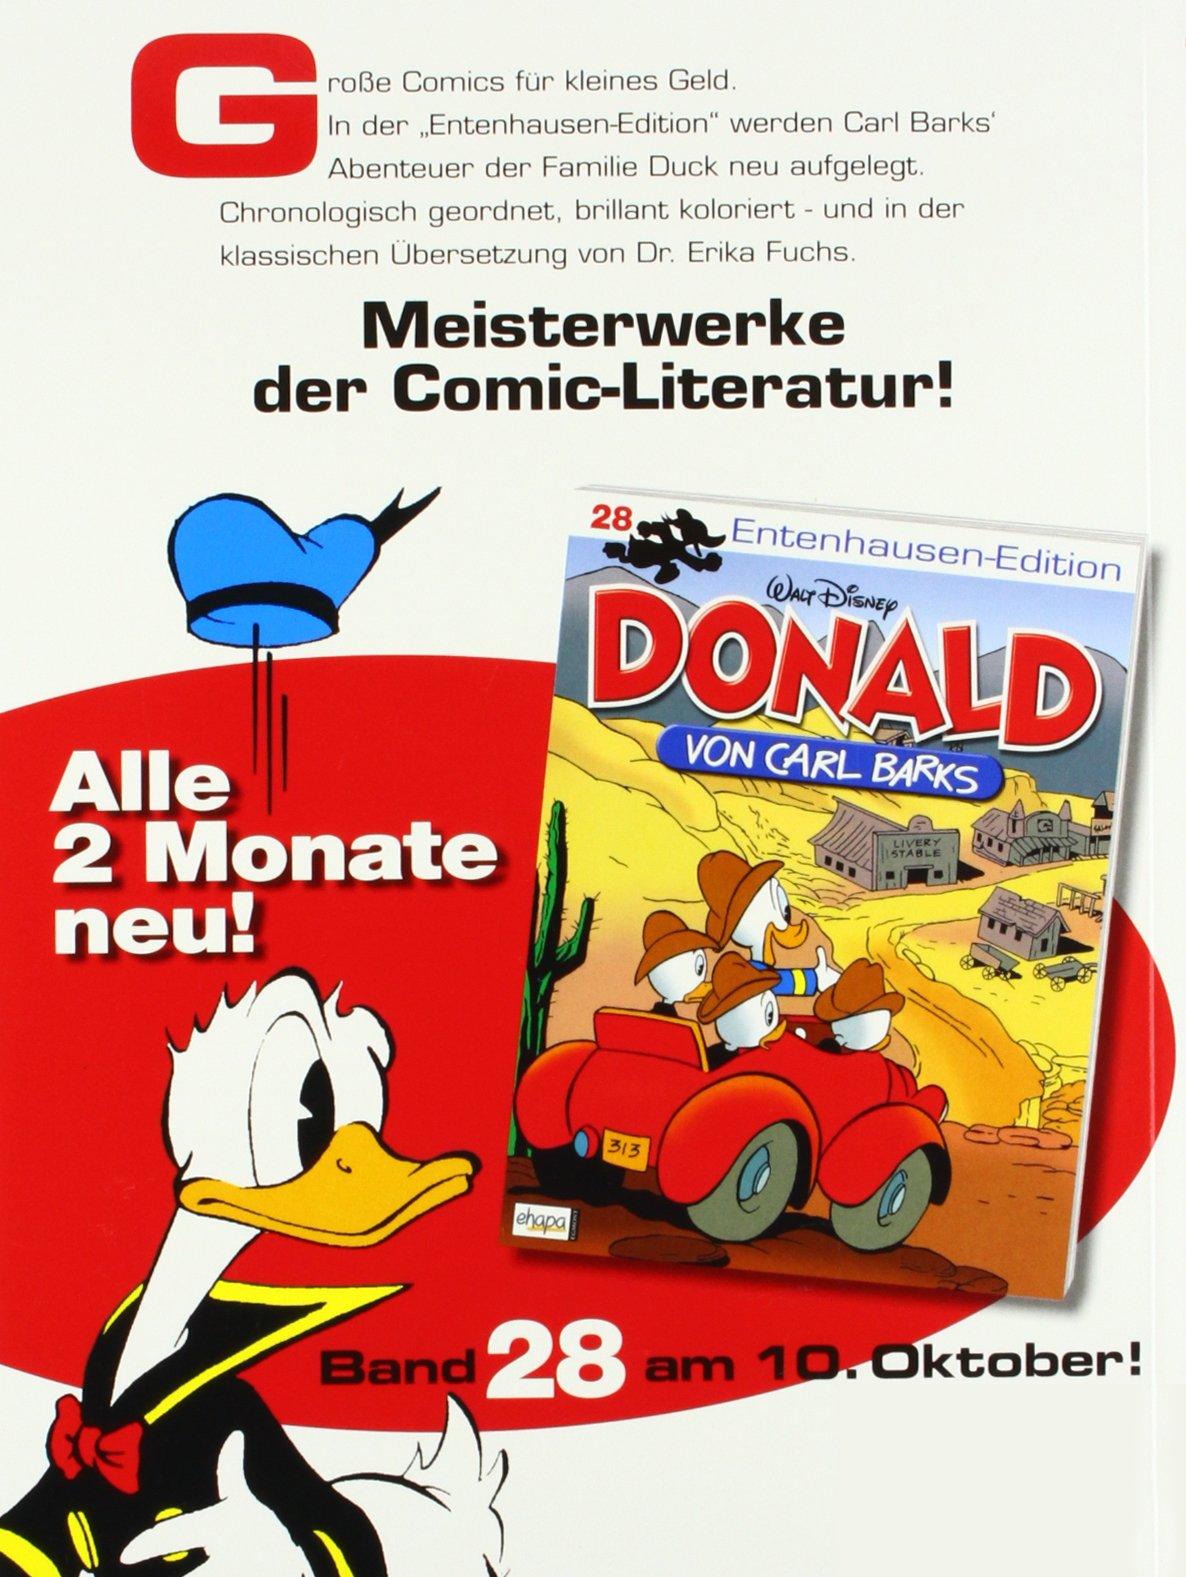 Bd.34 Barks Donald Walt Carl Barks Entenhau Entenhausen-Edition Carl Disney